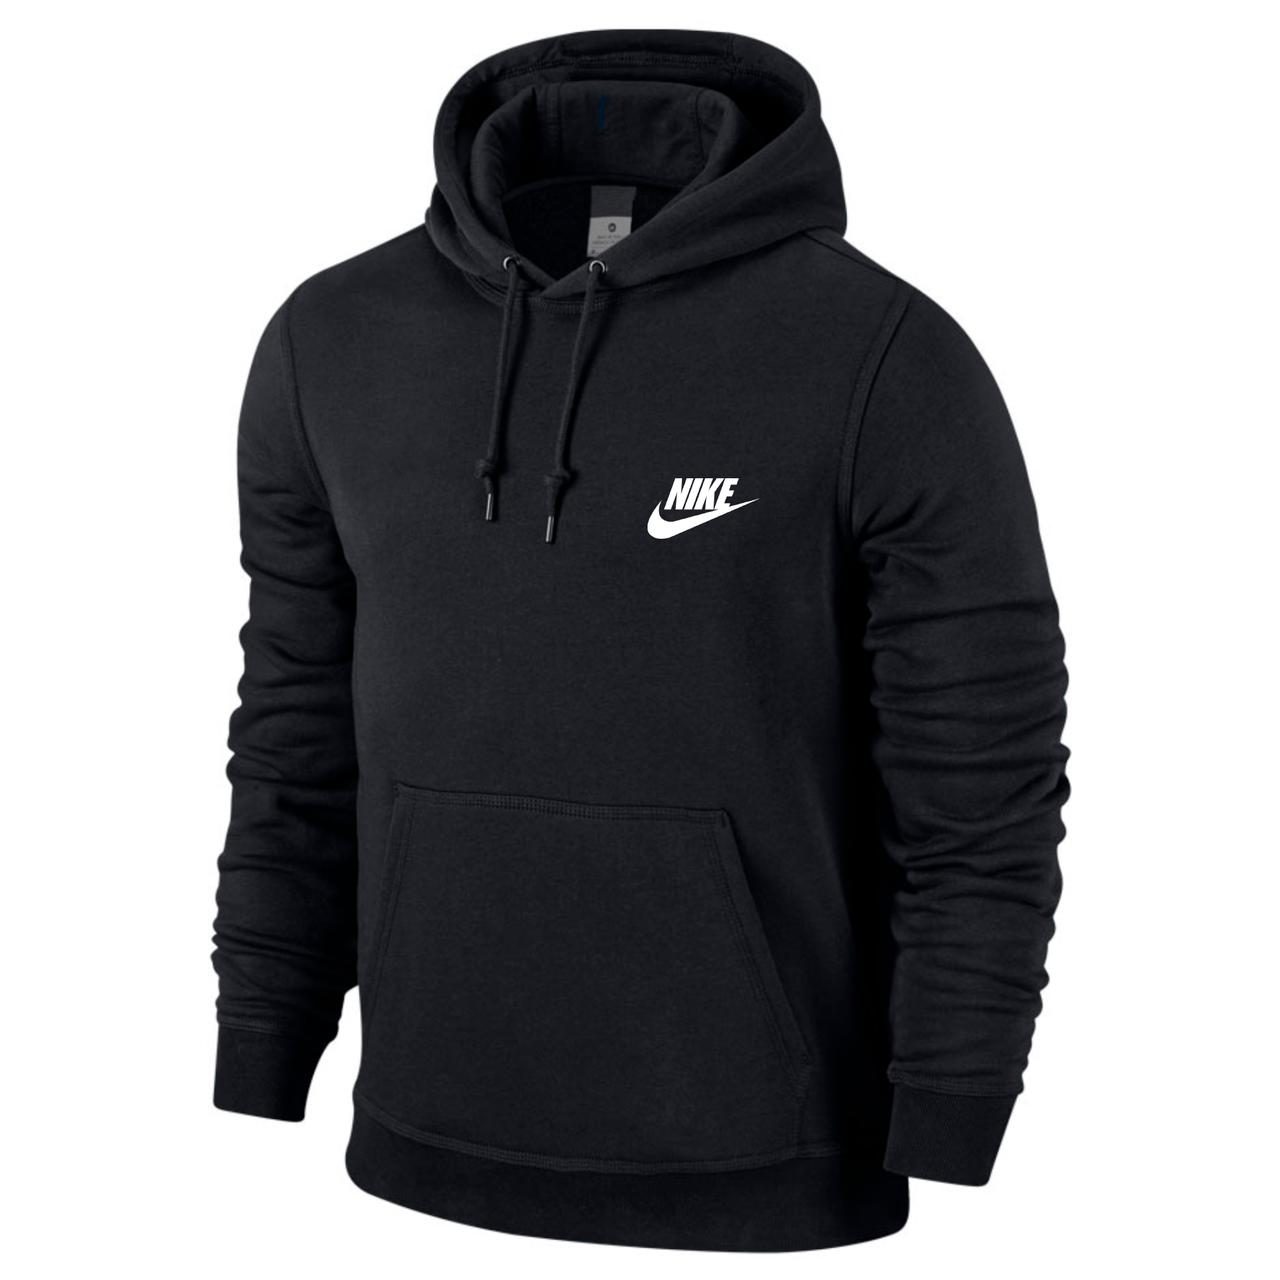 Спортивная мужская кофта Nike, черная